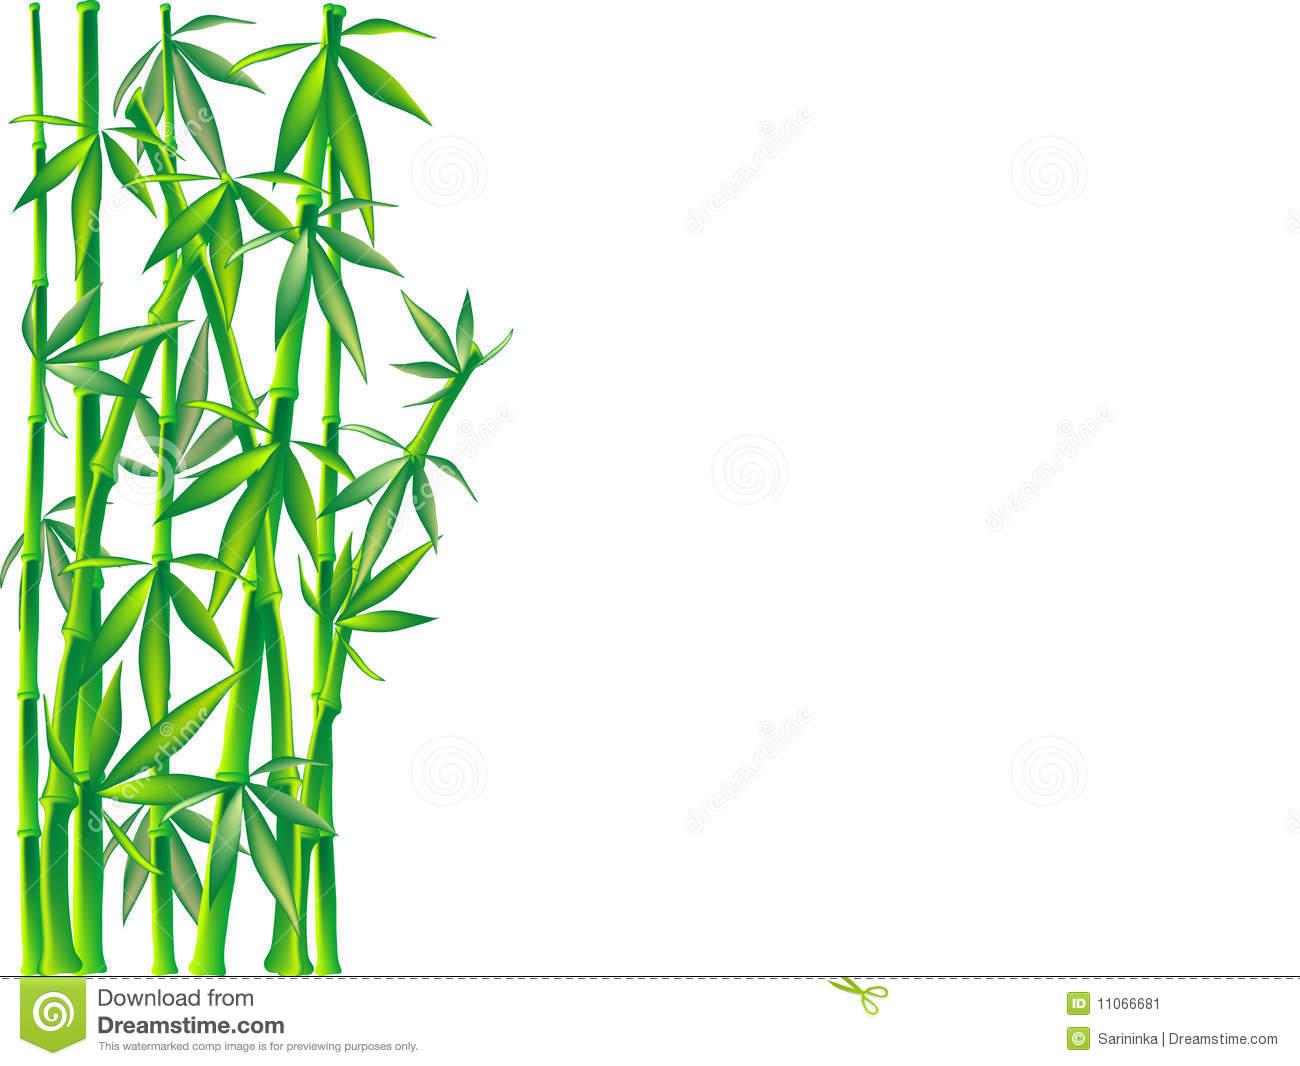 Bamboo borders or clip art.